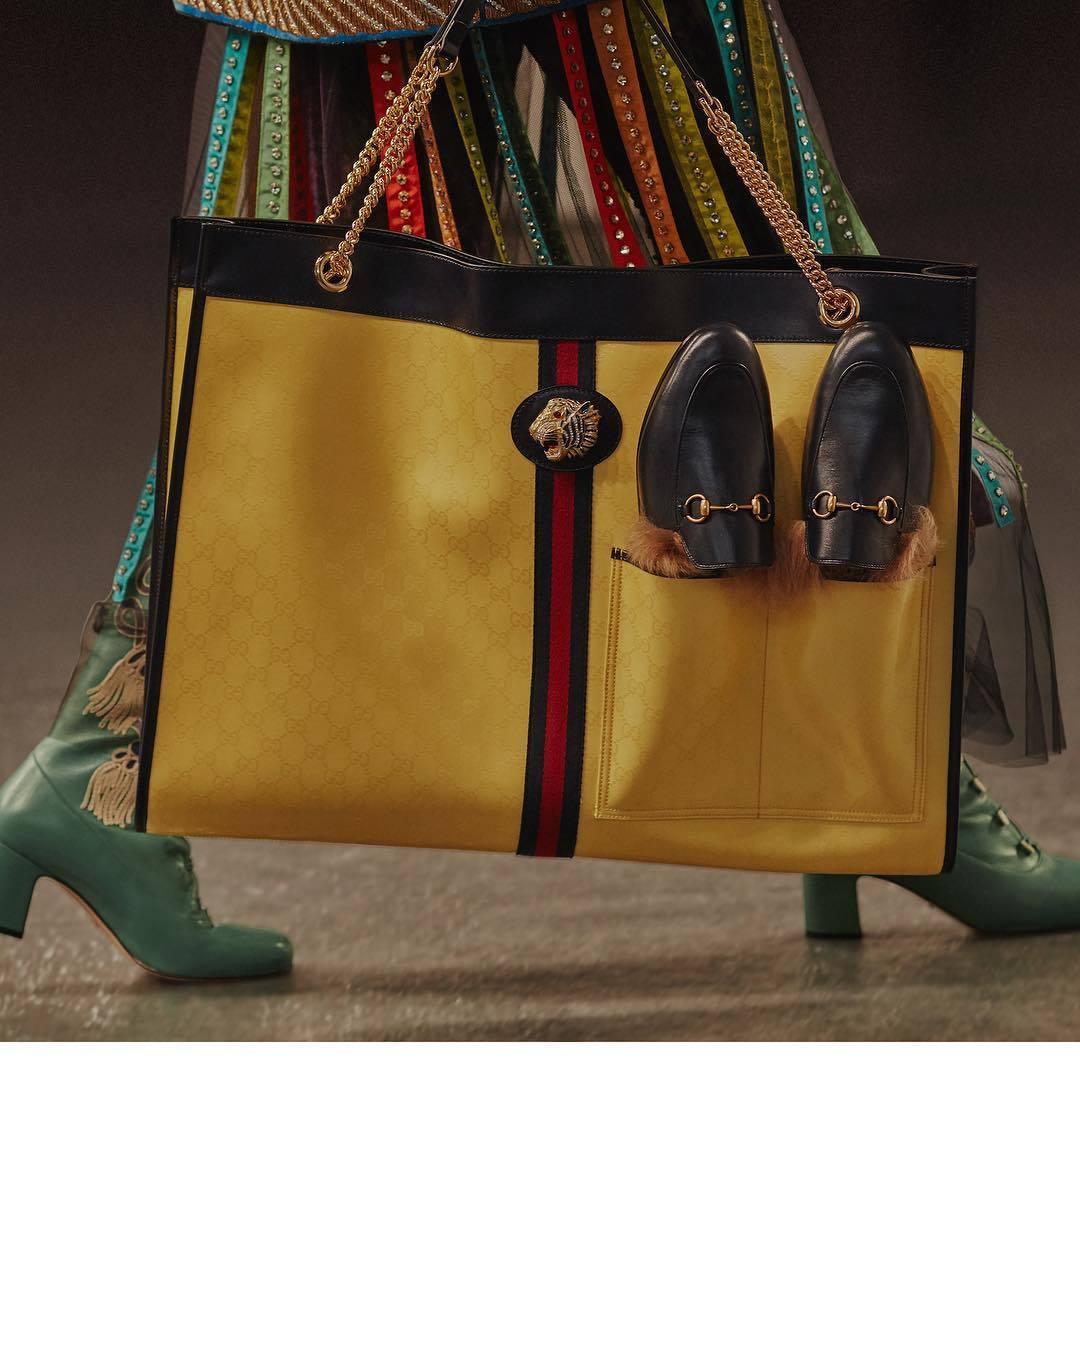 GUCCI早春有托特包以及後背包款都有置放鞋履的新設計。圖/取自品牌IG